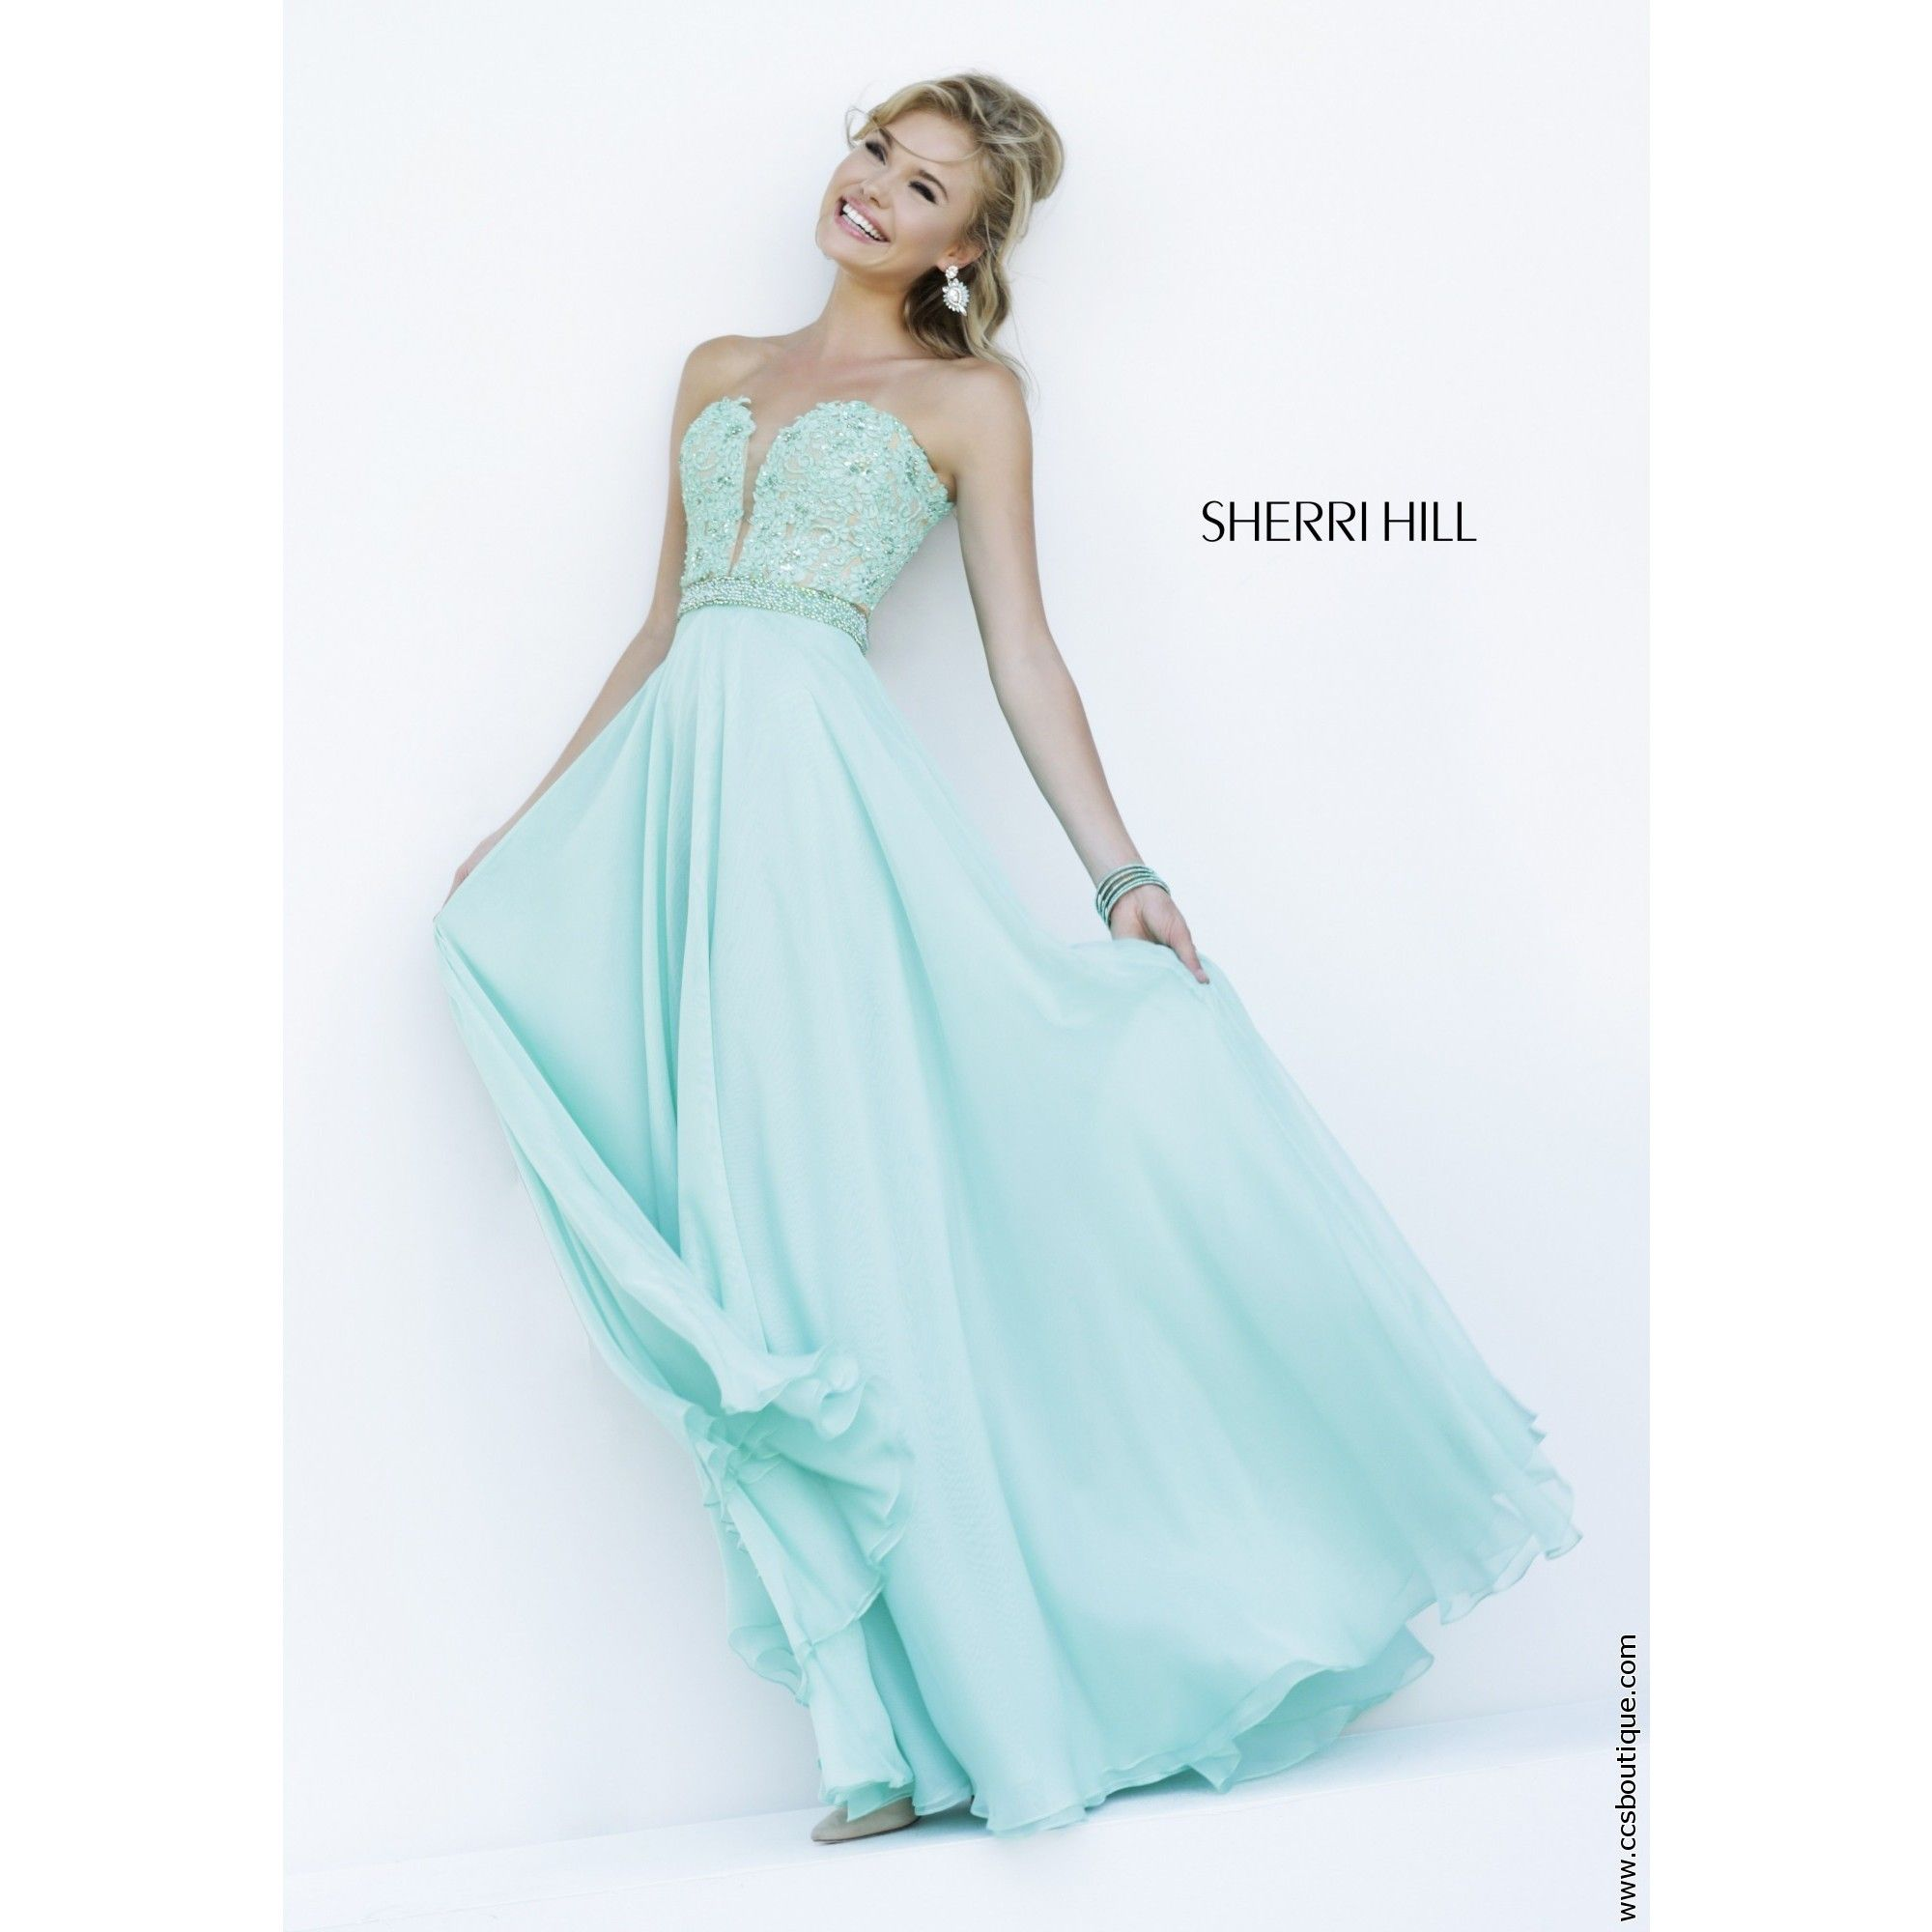 Sherri Hill 32180|Sherri Hill prom dress 32180|tampabridalshops.com ...